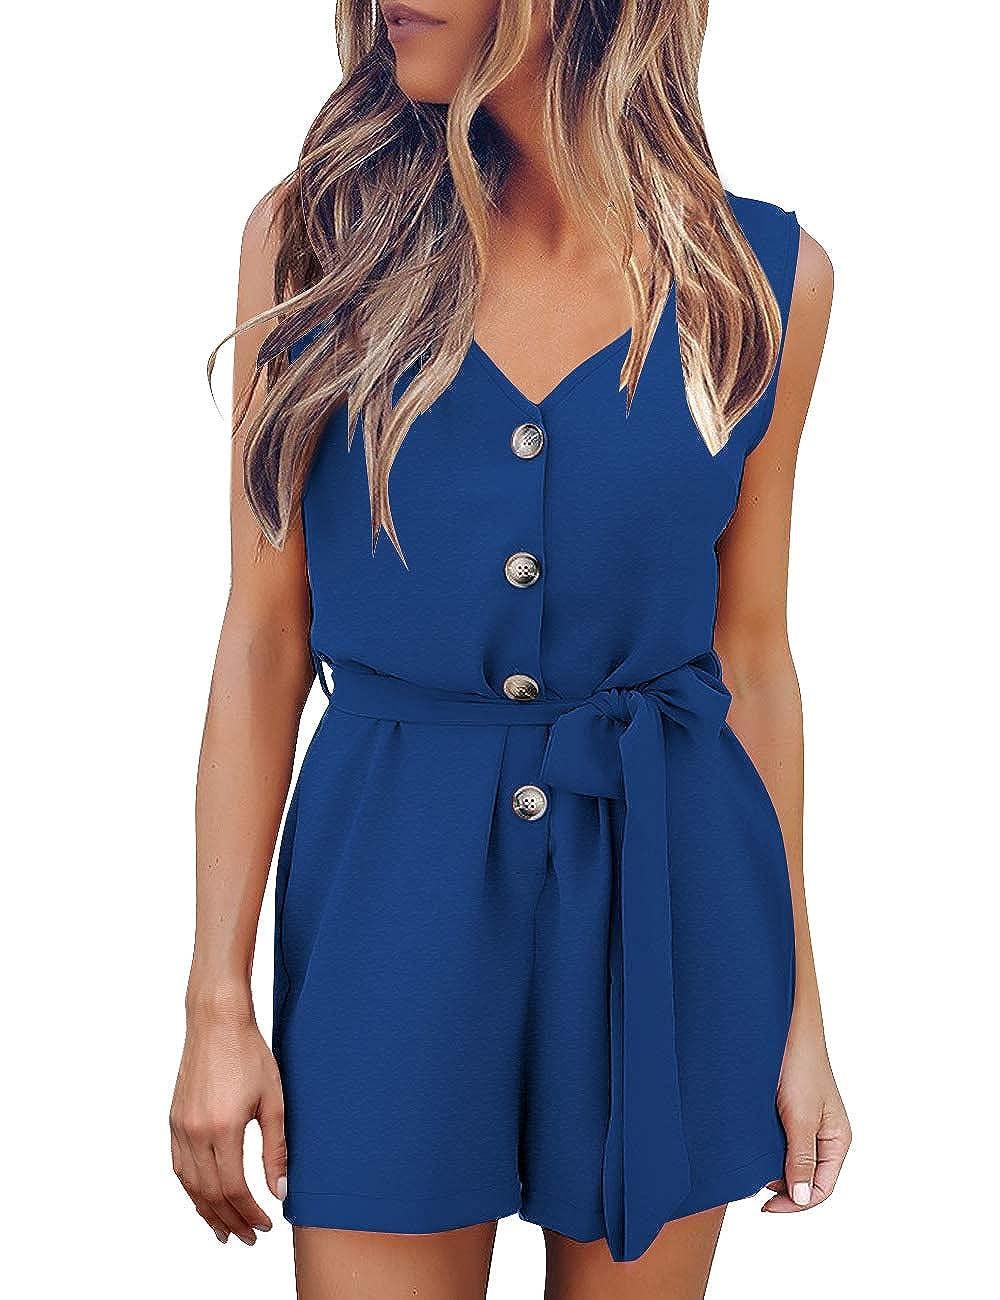 GRAPENT Women/'s V Neck Sleeveless Button Front Self Tie Romper Jumpsuit